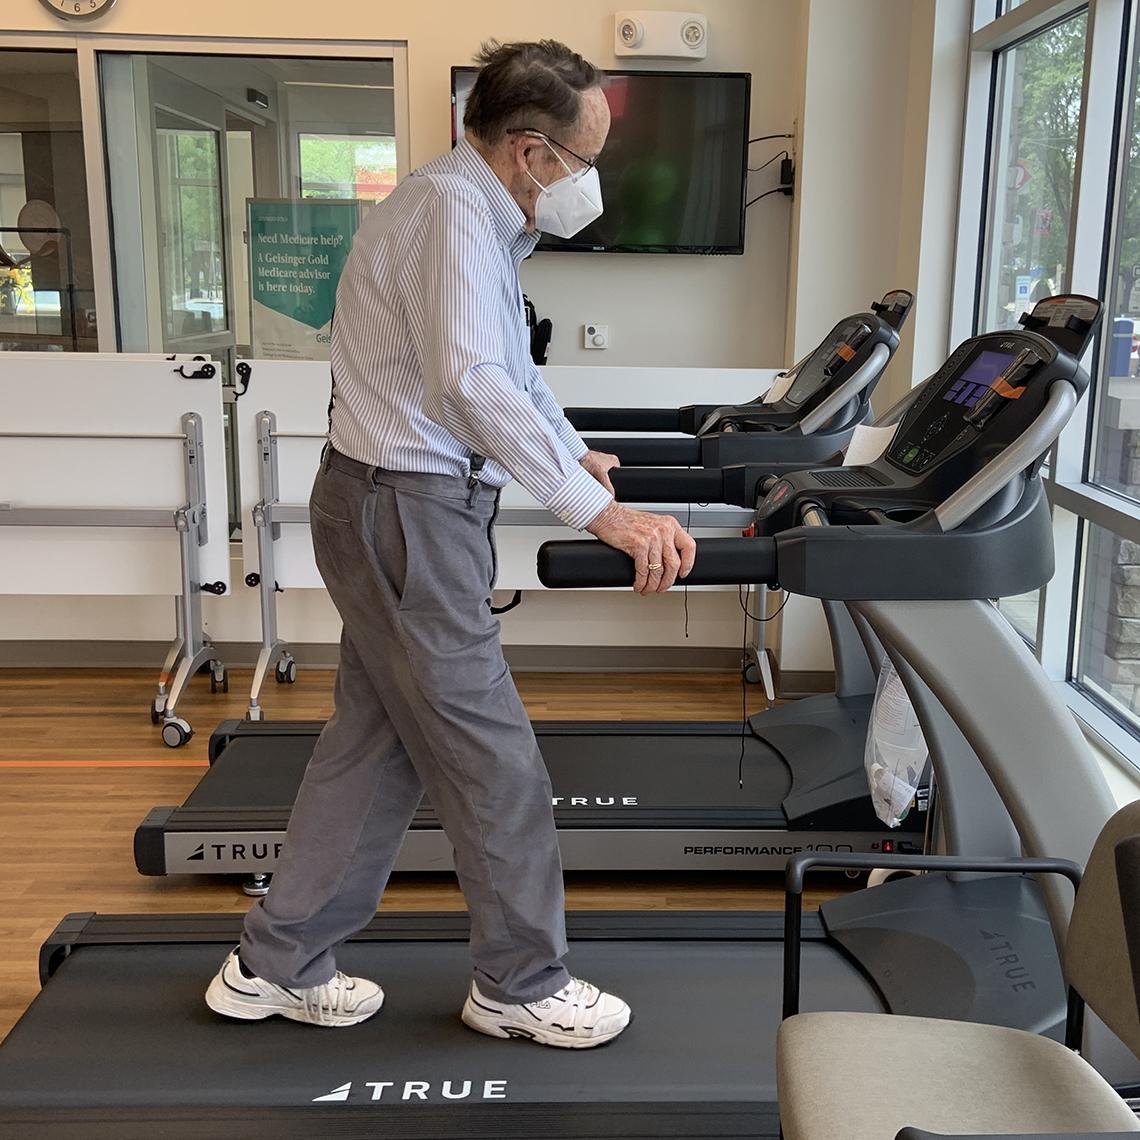 man using a treadmill, wearing a face mask